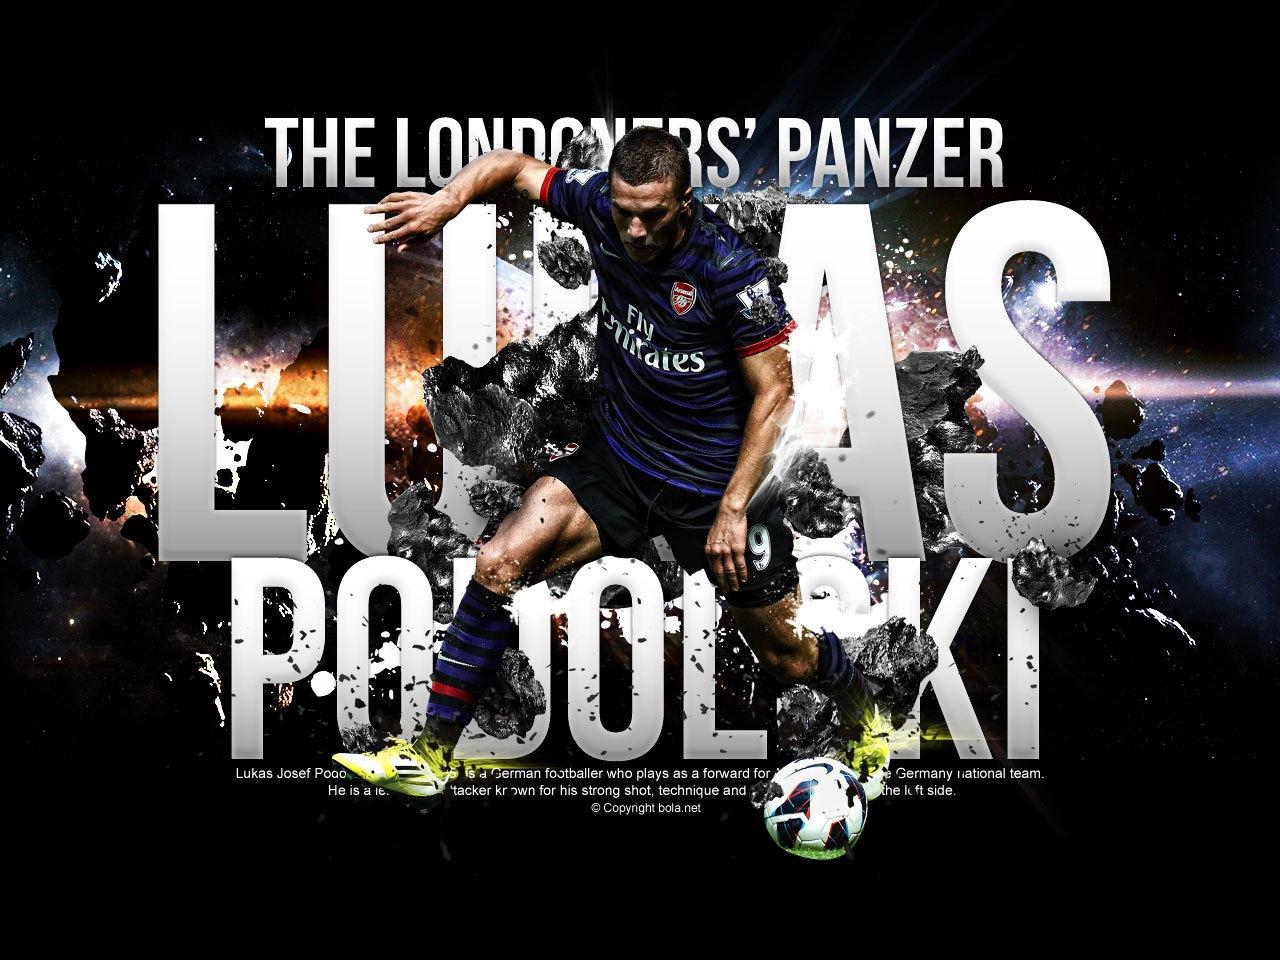 http://4.bp.blogspot.com/-YUdvdhyupyQ/UUccKwKK1nI/AAAAAAAABHg/QaQr9wzXag4/s1600/Lukas-Podolski-Arsenal-Wallpaper+sdfgh3456.jpg